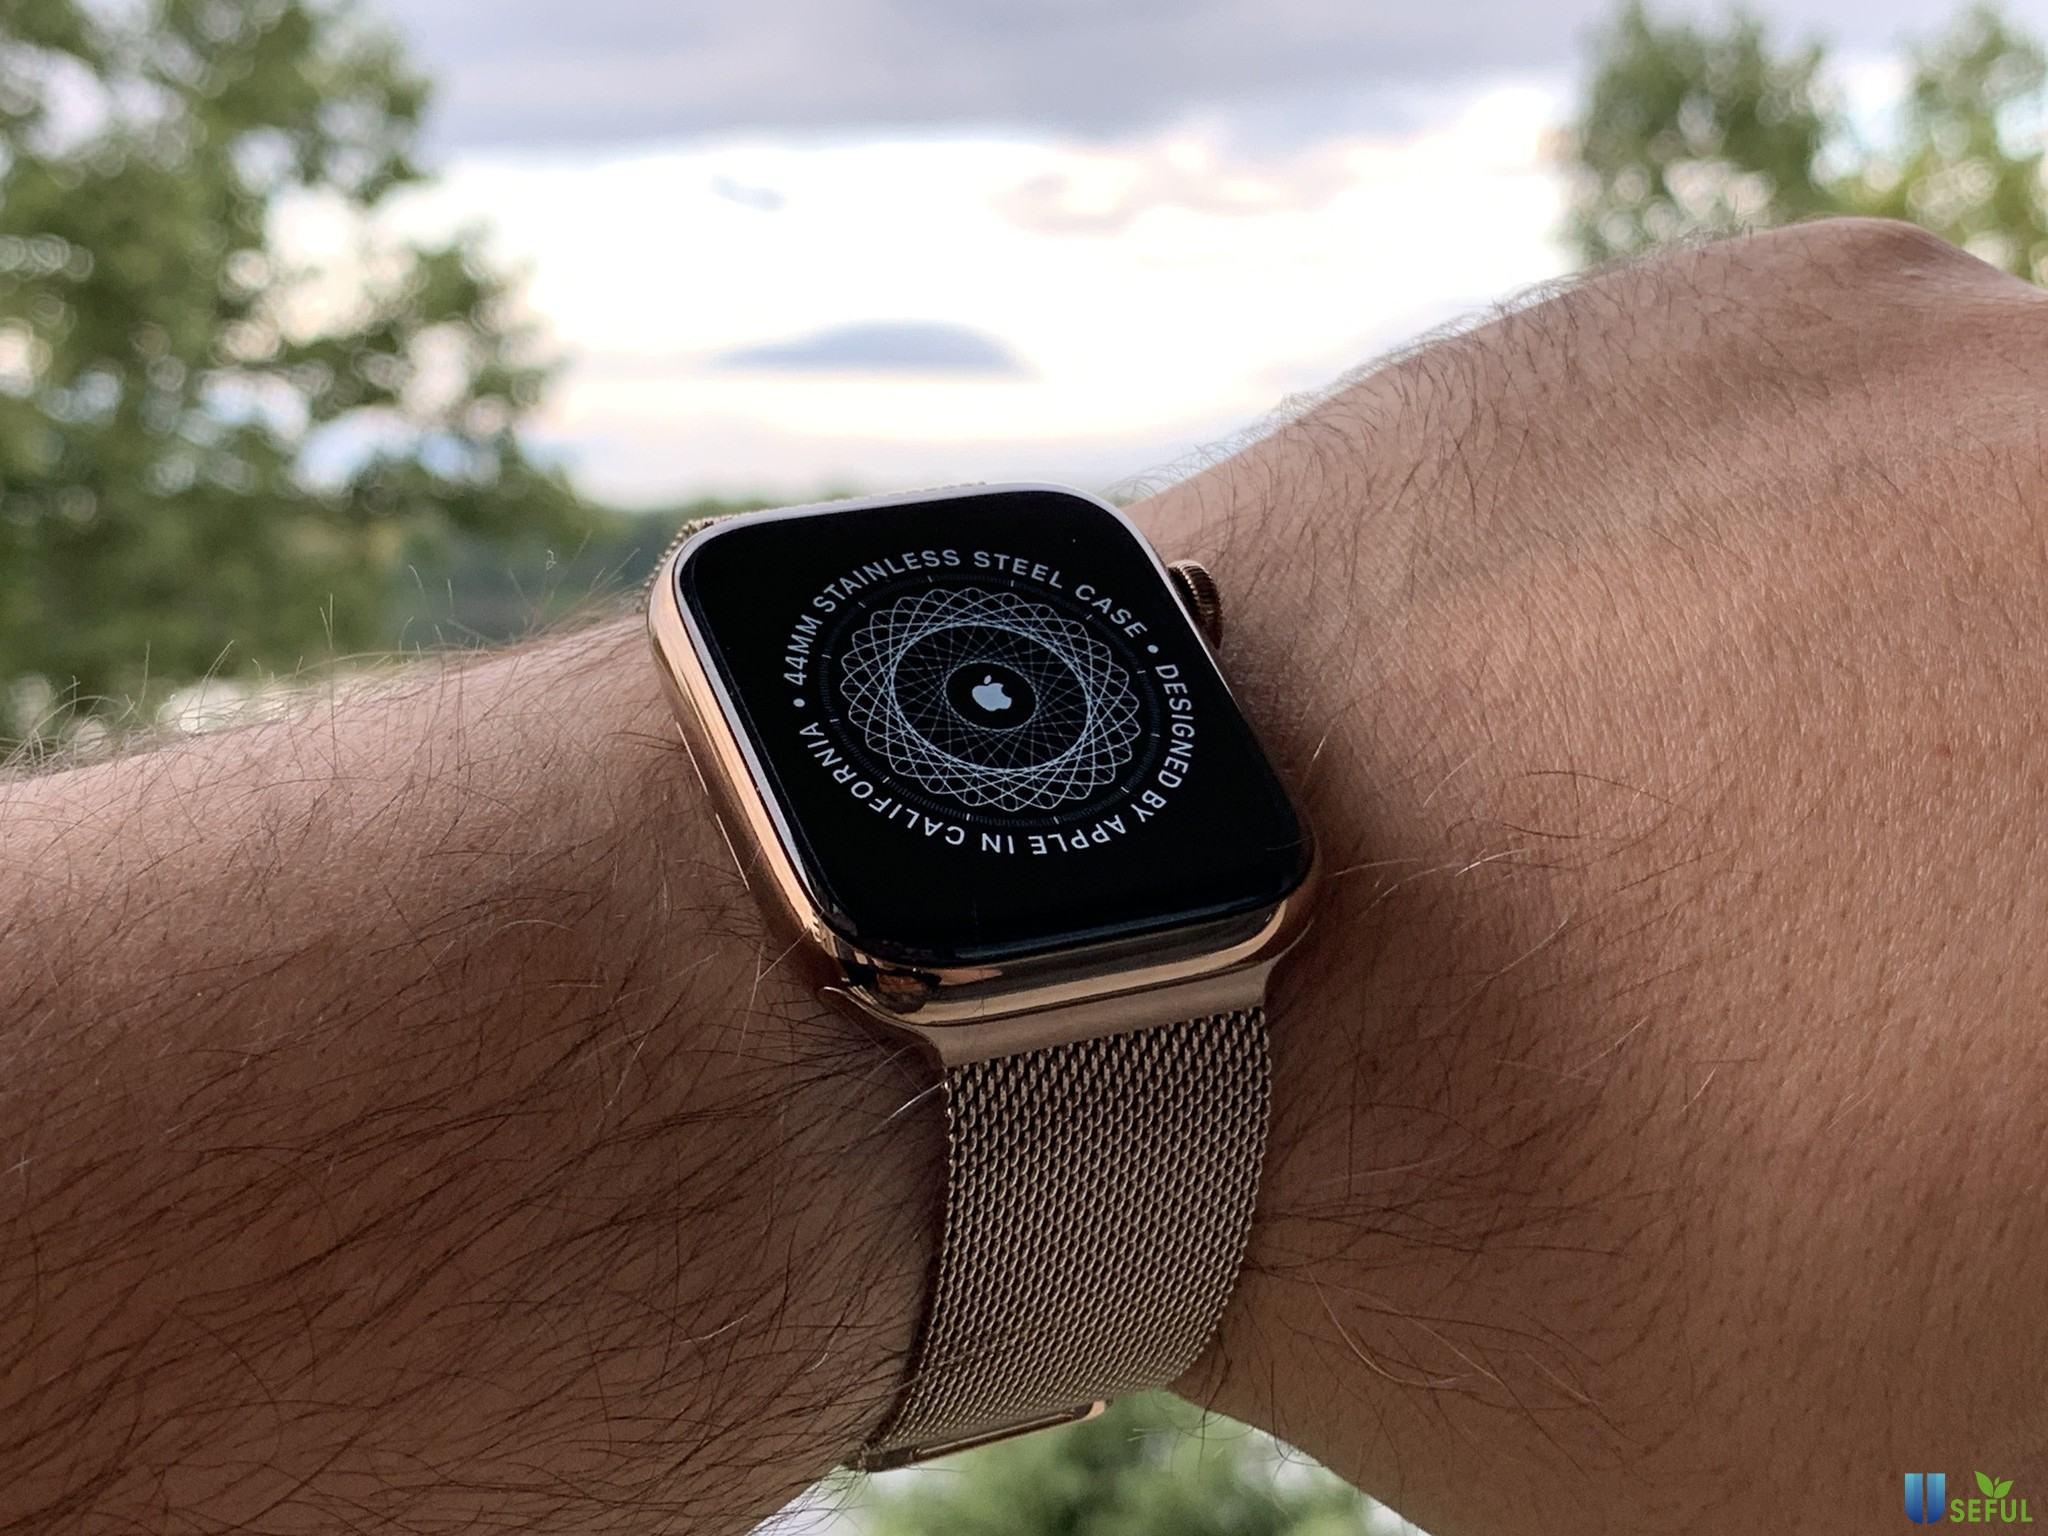 Apple Watch Series 4 cải tiến bản thép